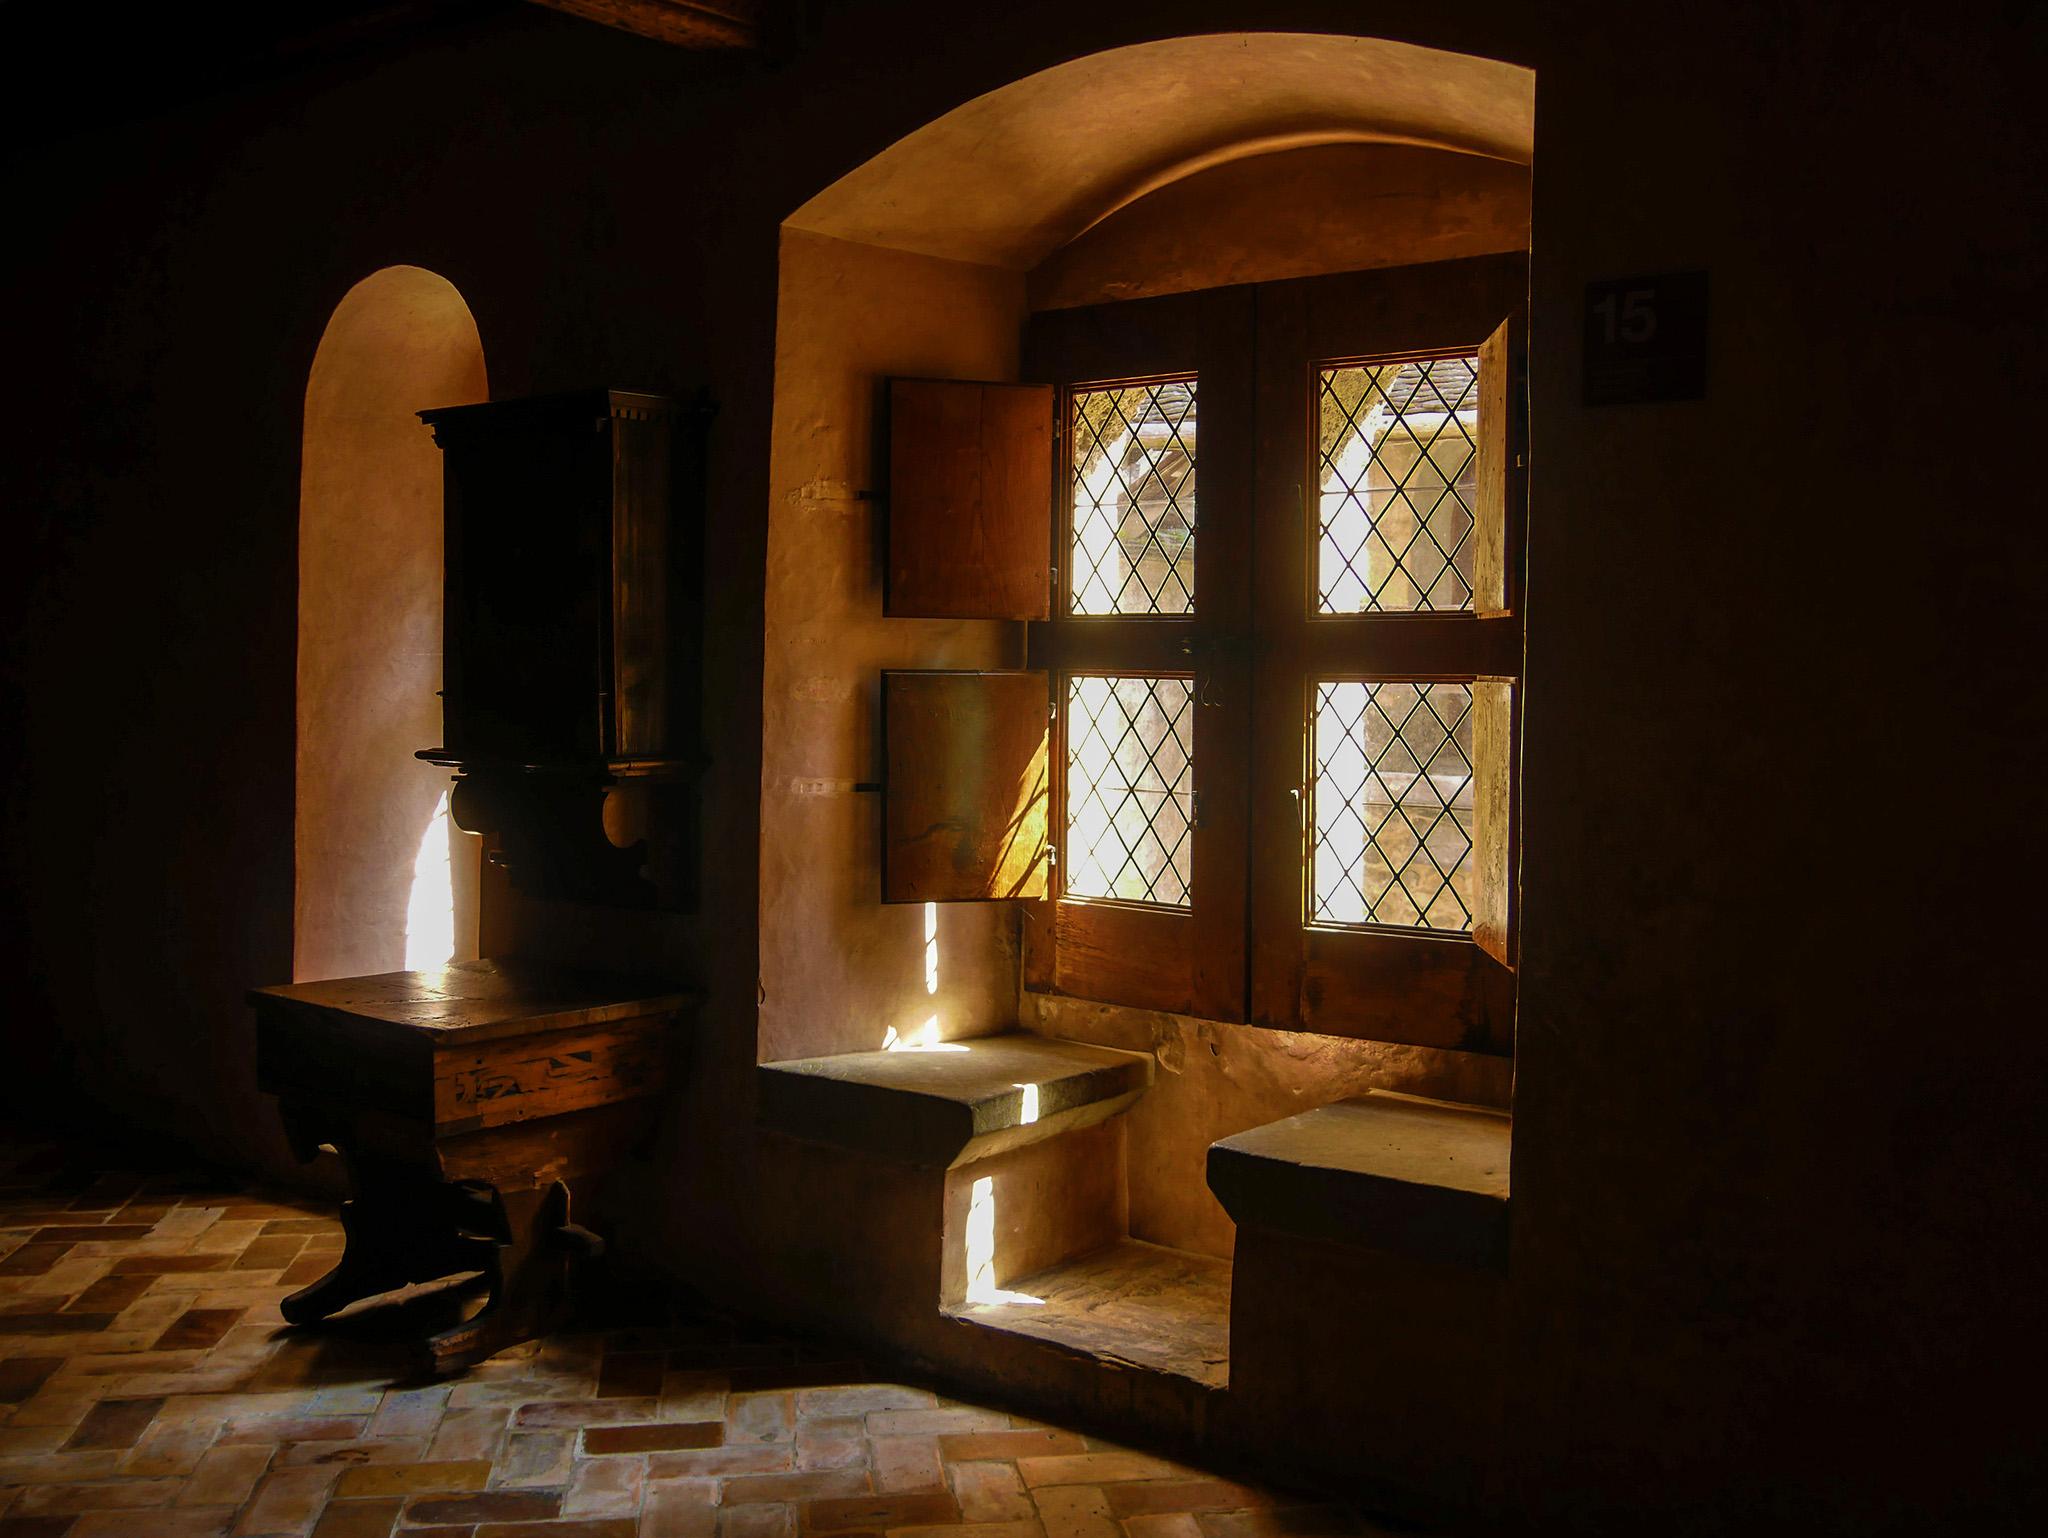 kt_2020_300_Keytours_excursions_Swisstours_chateau chillon46_2048_10